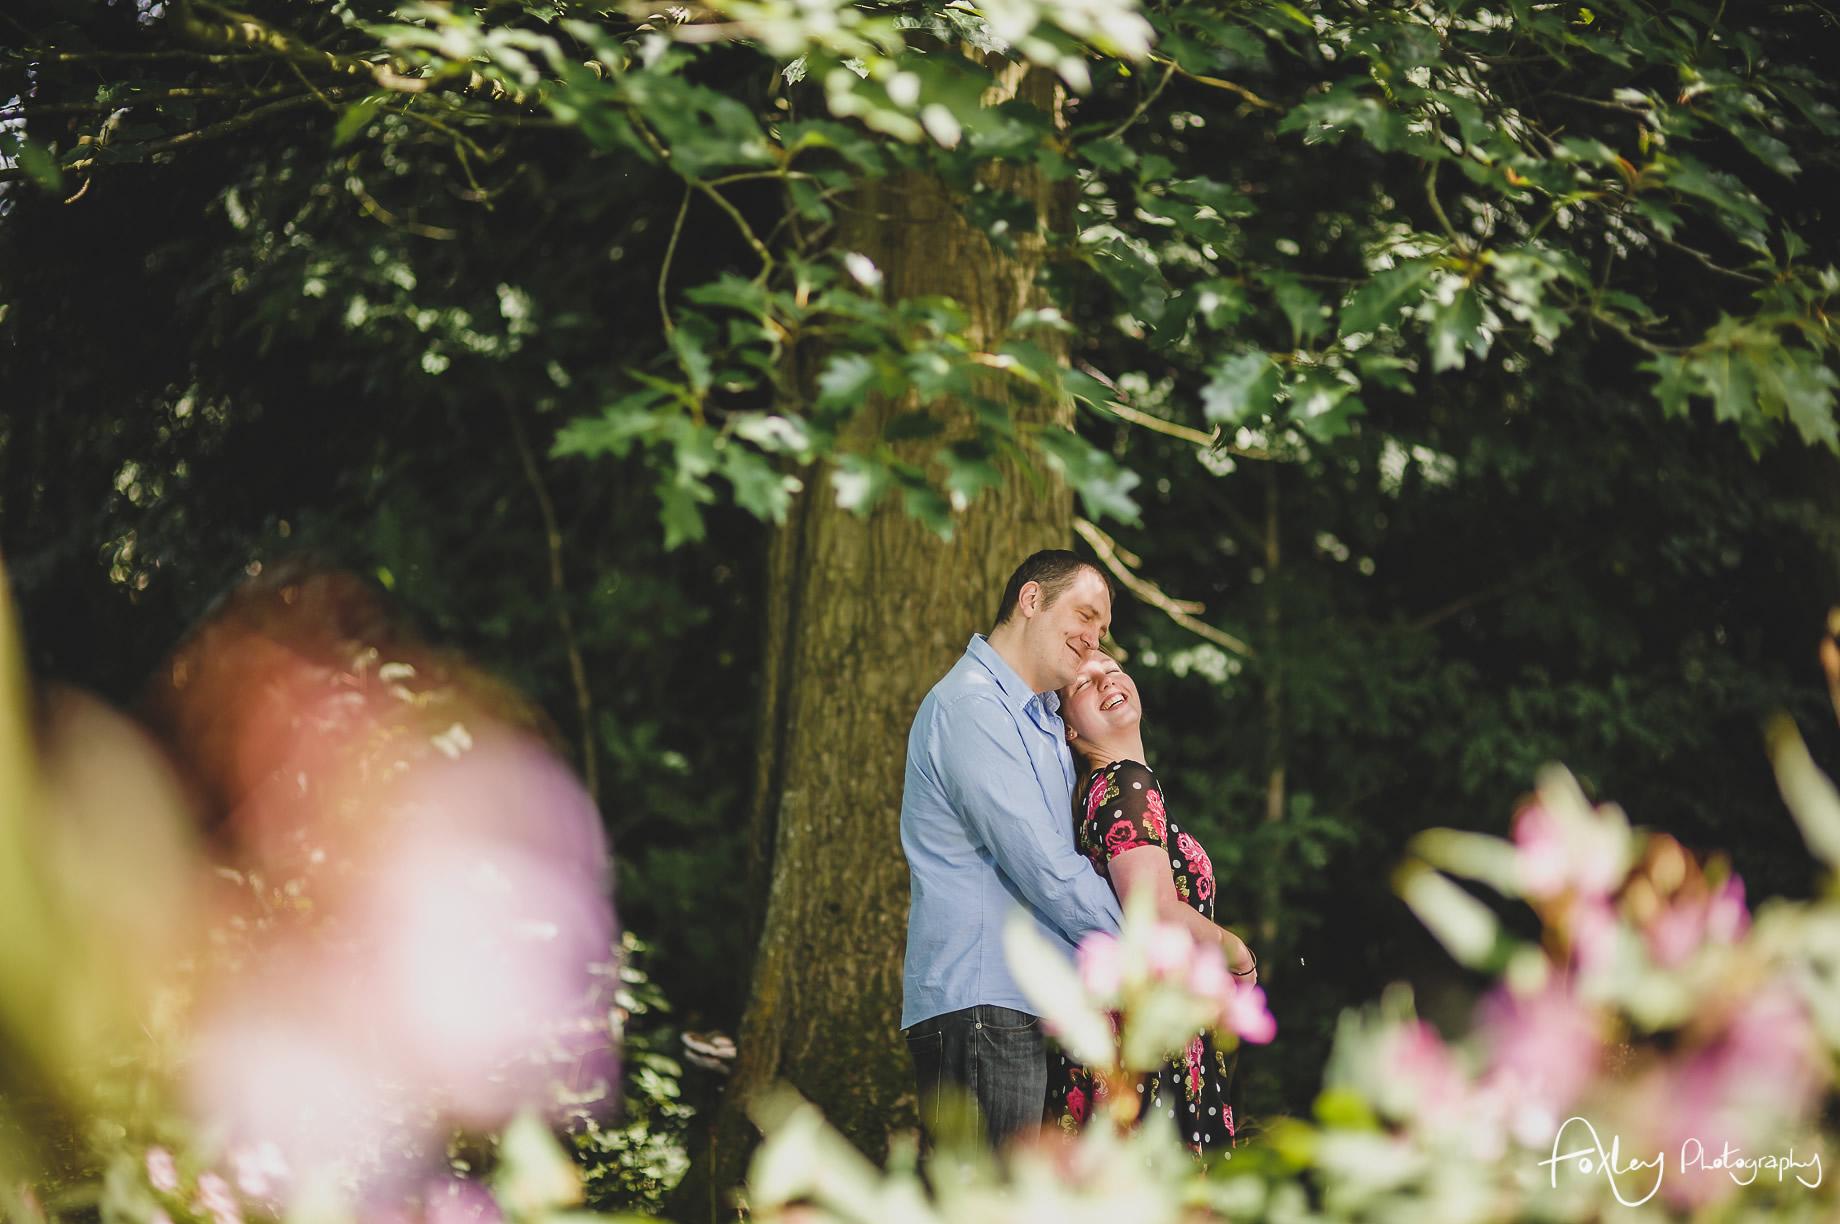 Faye and Doug Pre-Wedding Shoot at Haslam Park 009